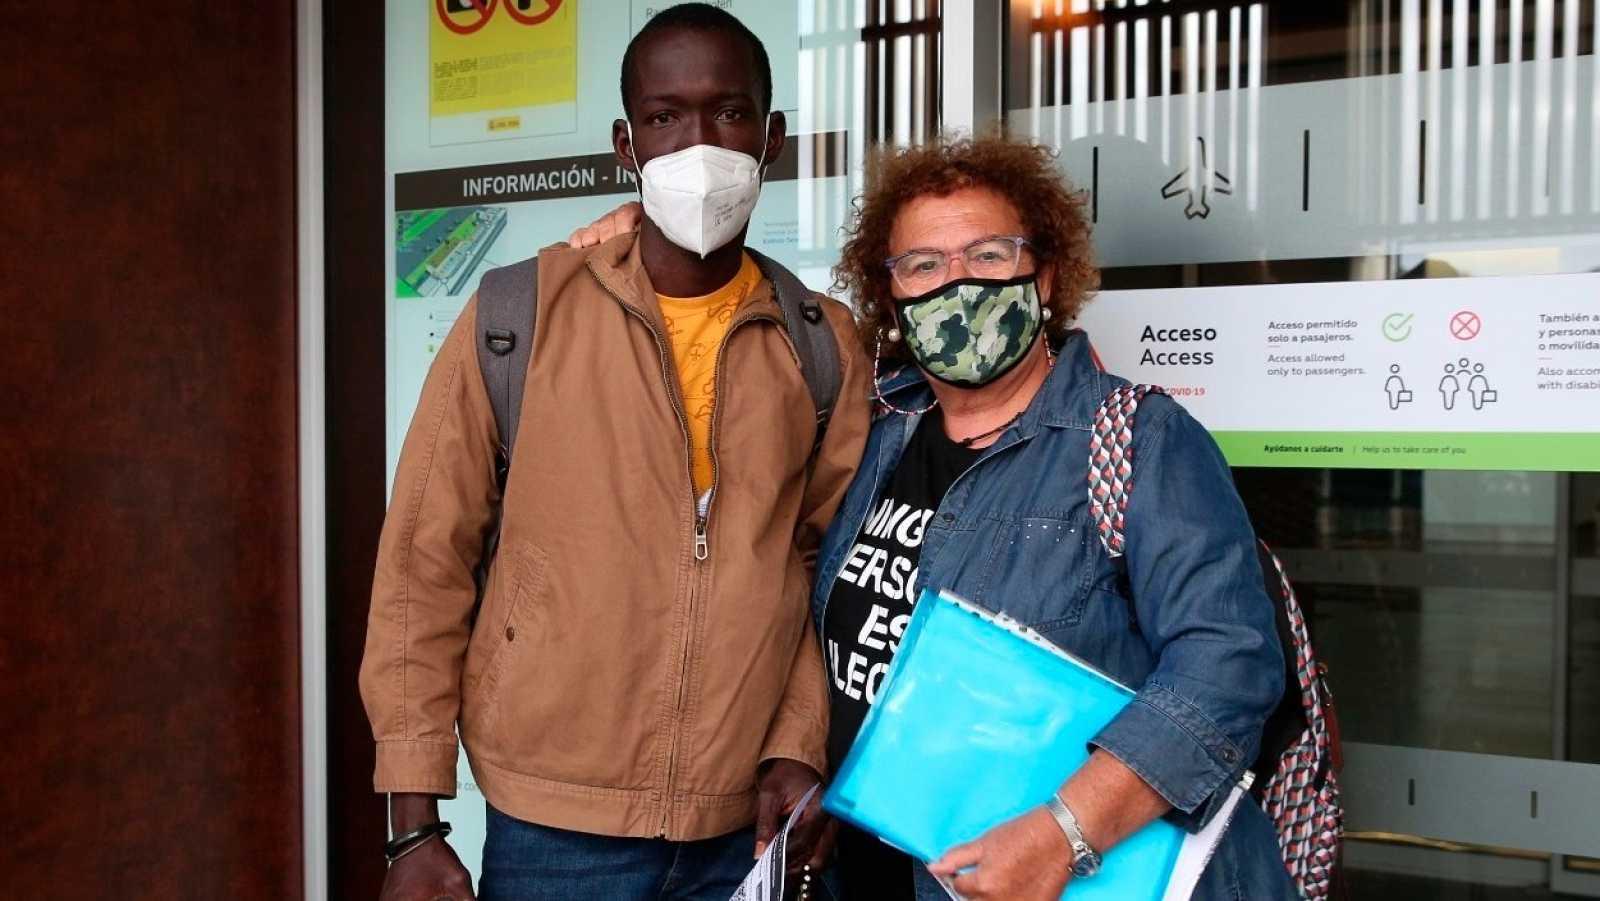 La historia de Youssouf e Isabel: un abrazo que traspasa fronteras